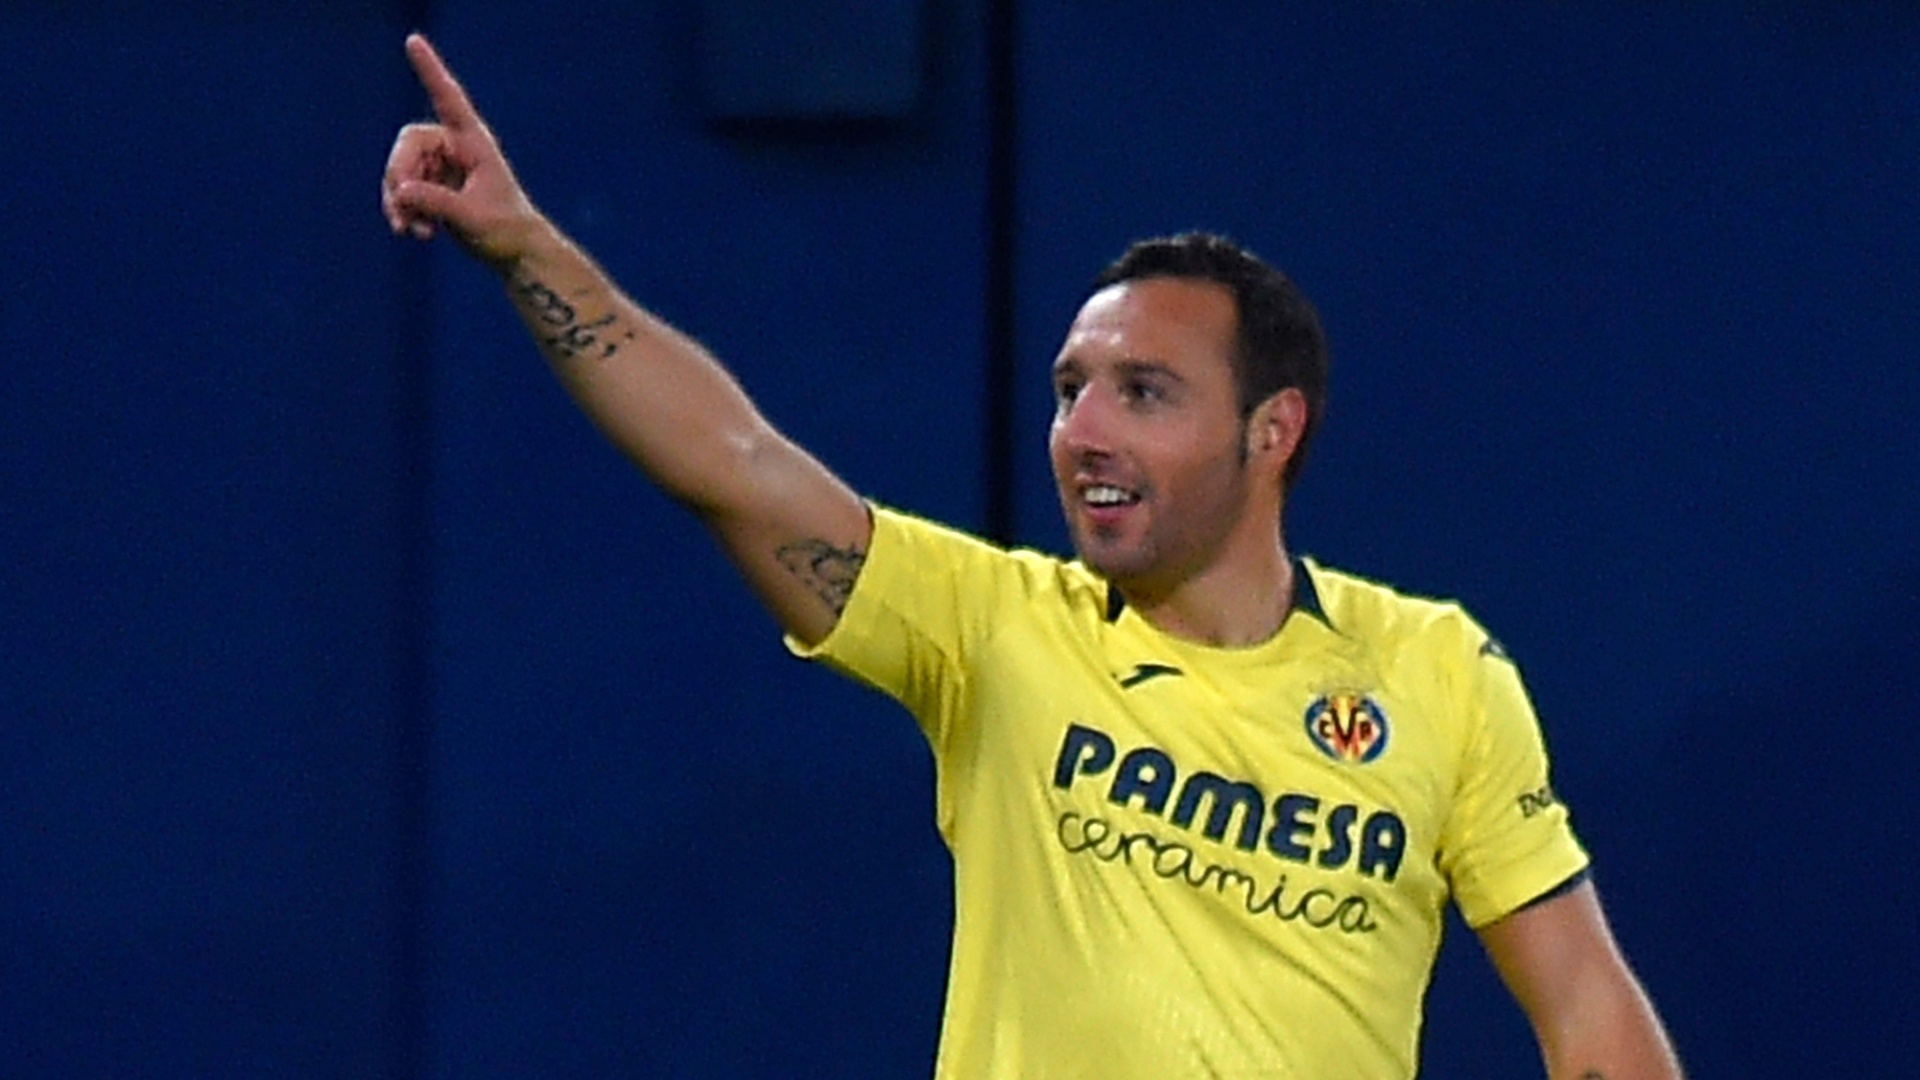 Cazorla comemora gol pelo Villarreal contra o Real Madrid